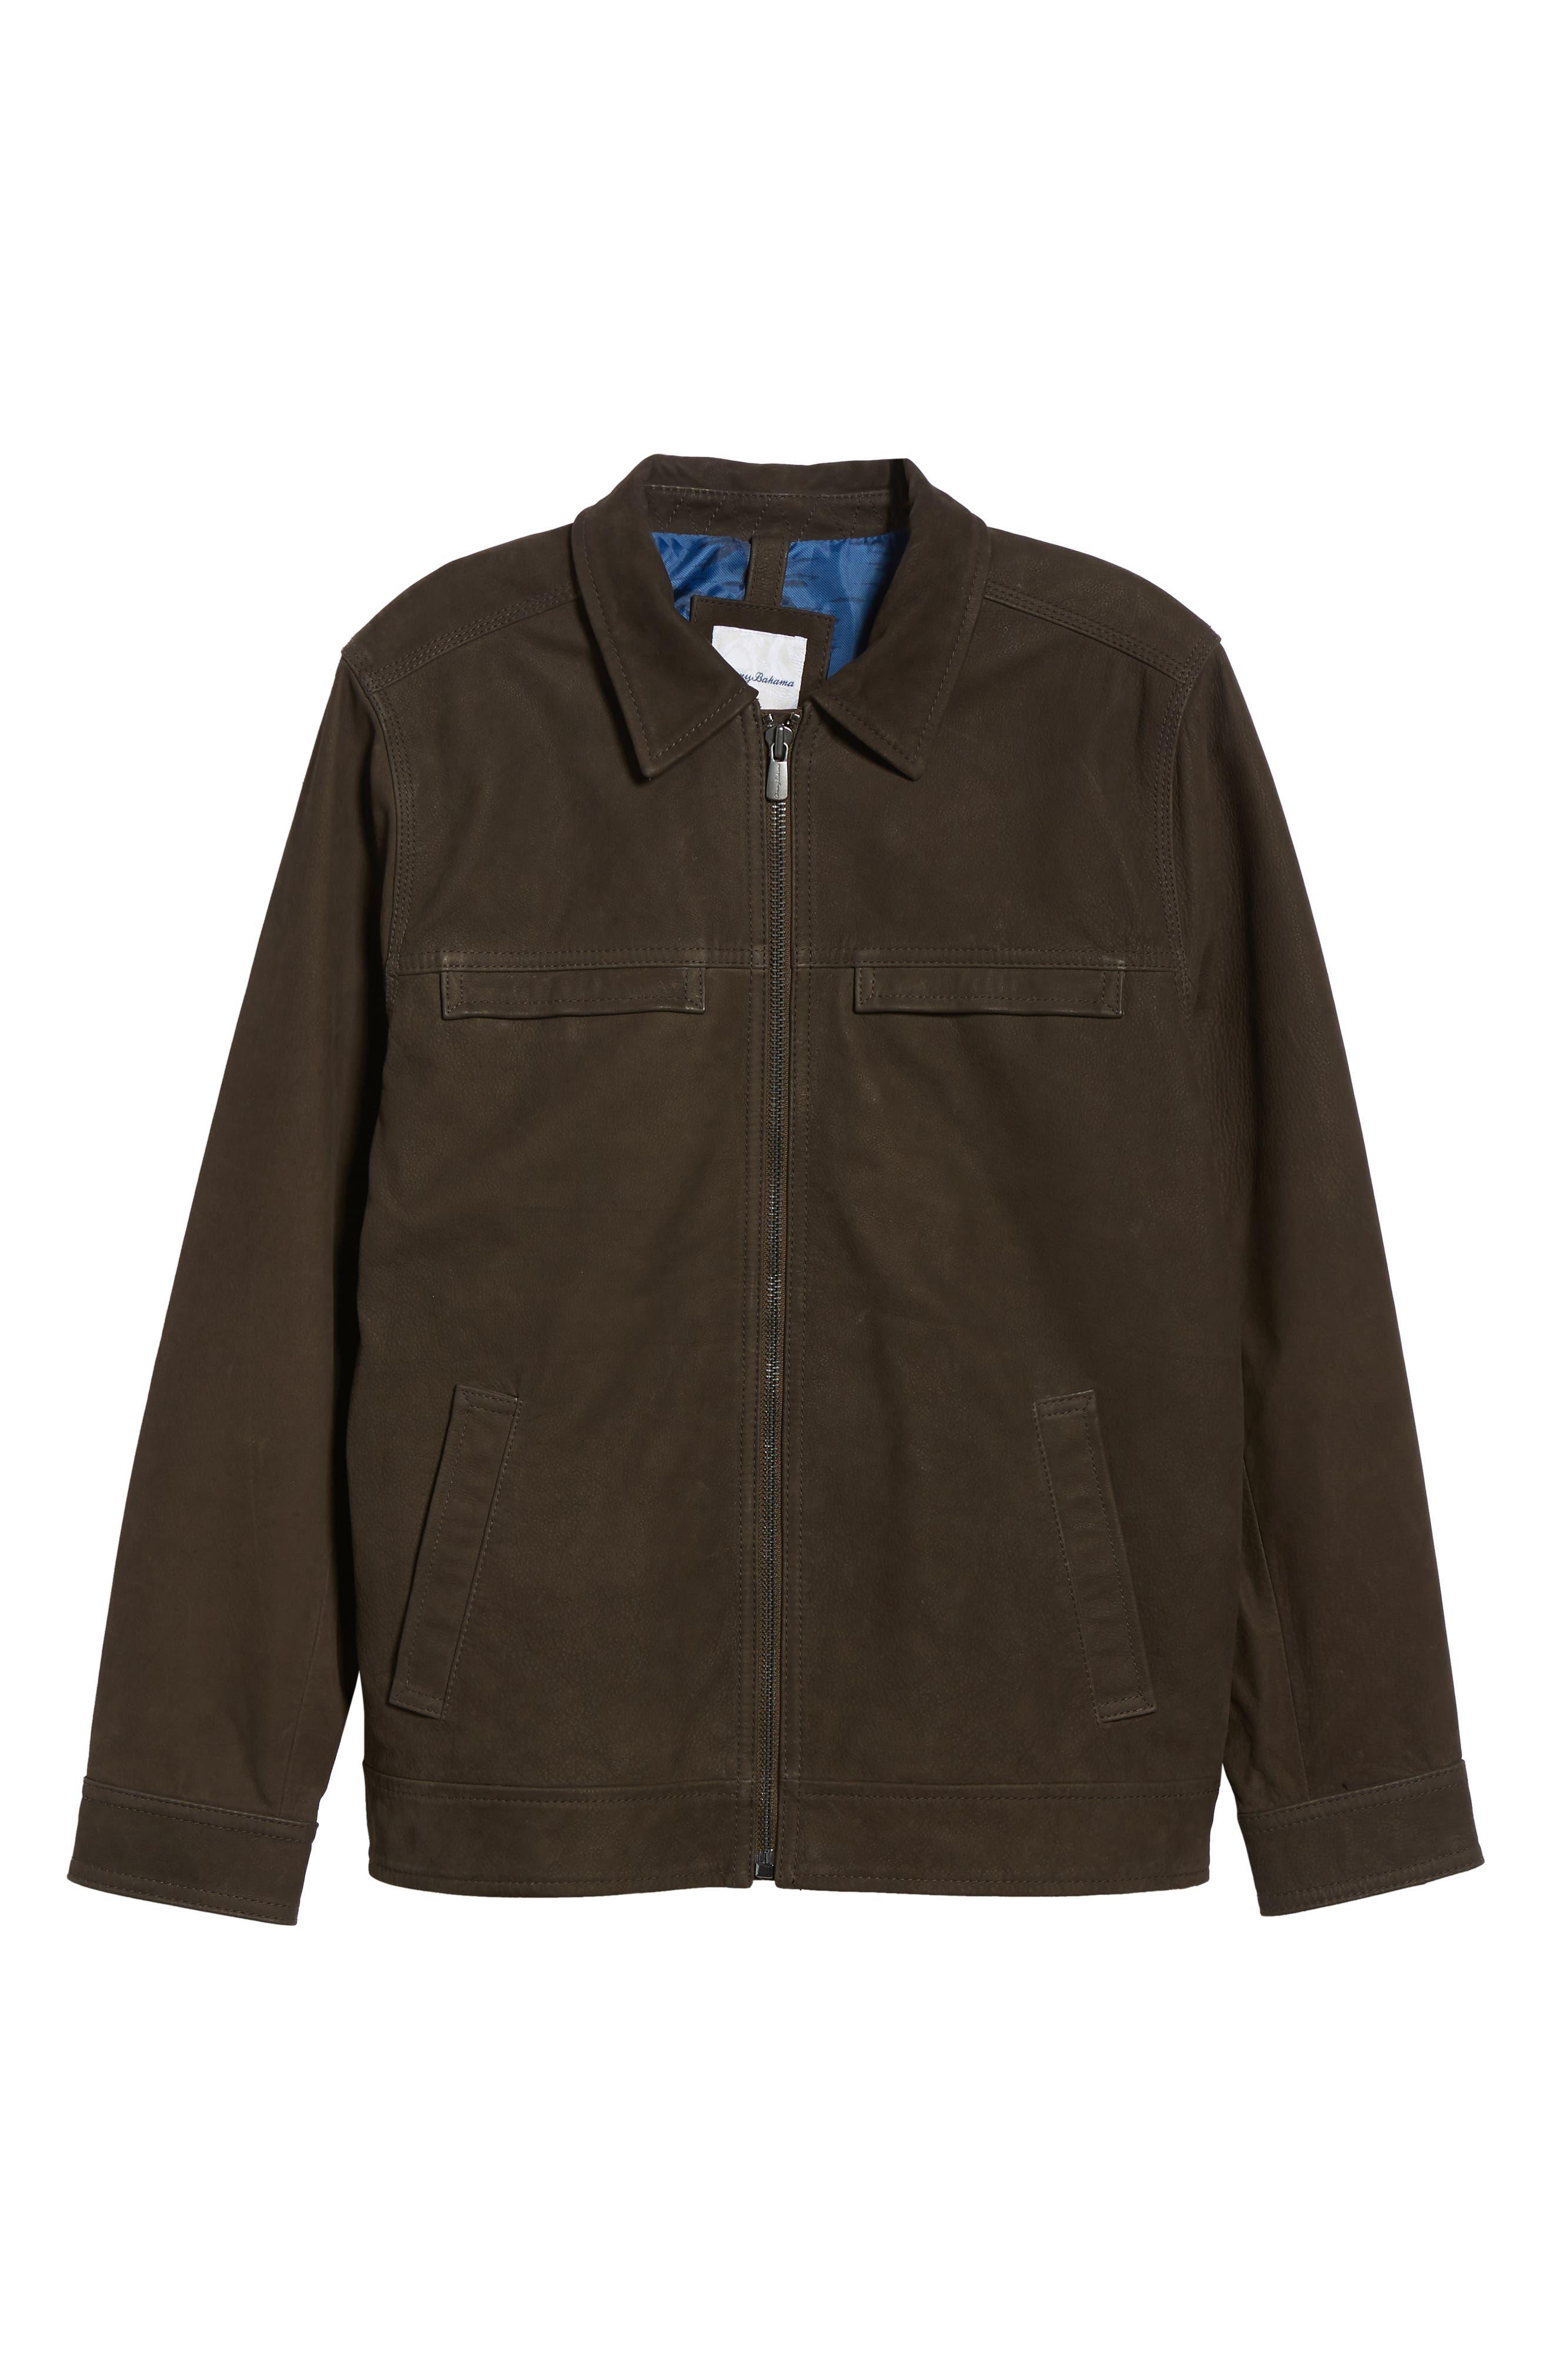 Elliott Bay Leather Jacket,                             Alternate thumbnail 5, color,                             COFFEE